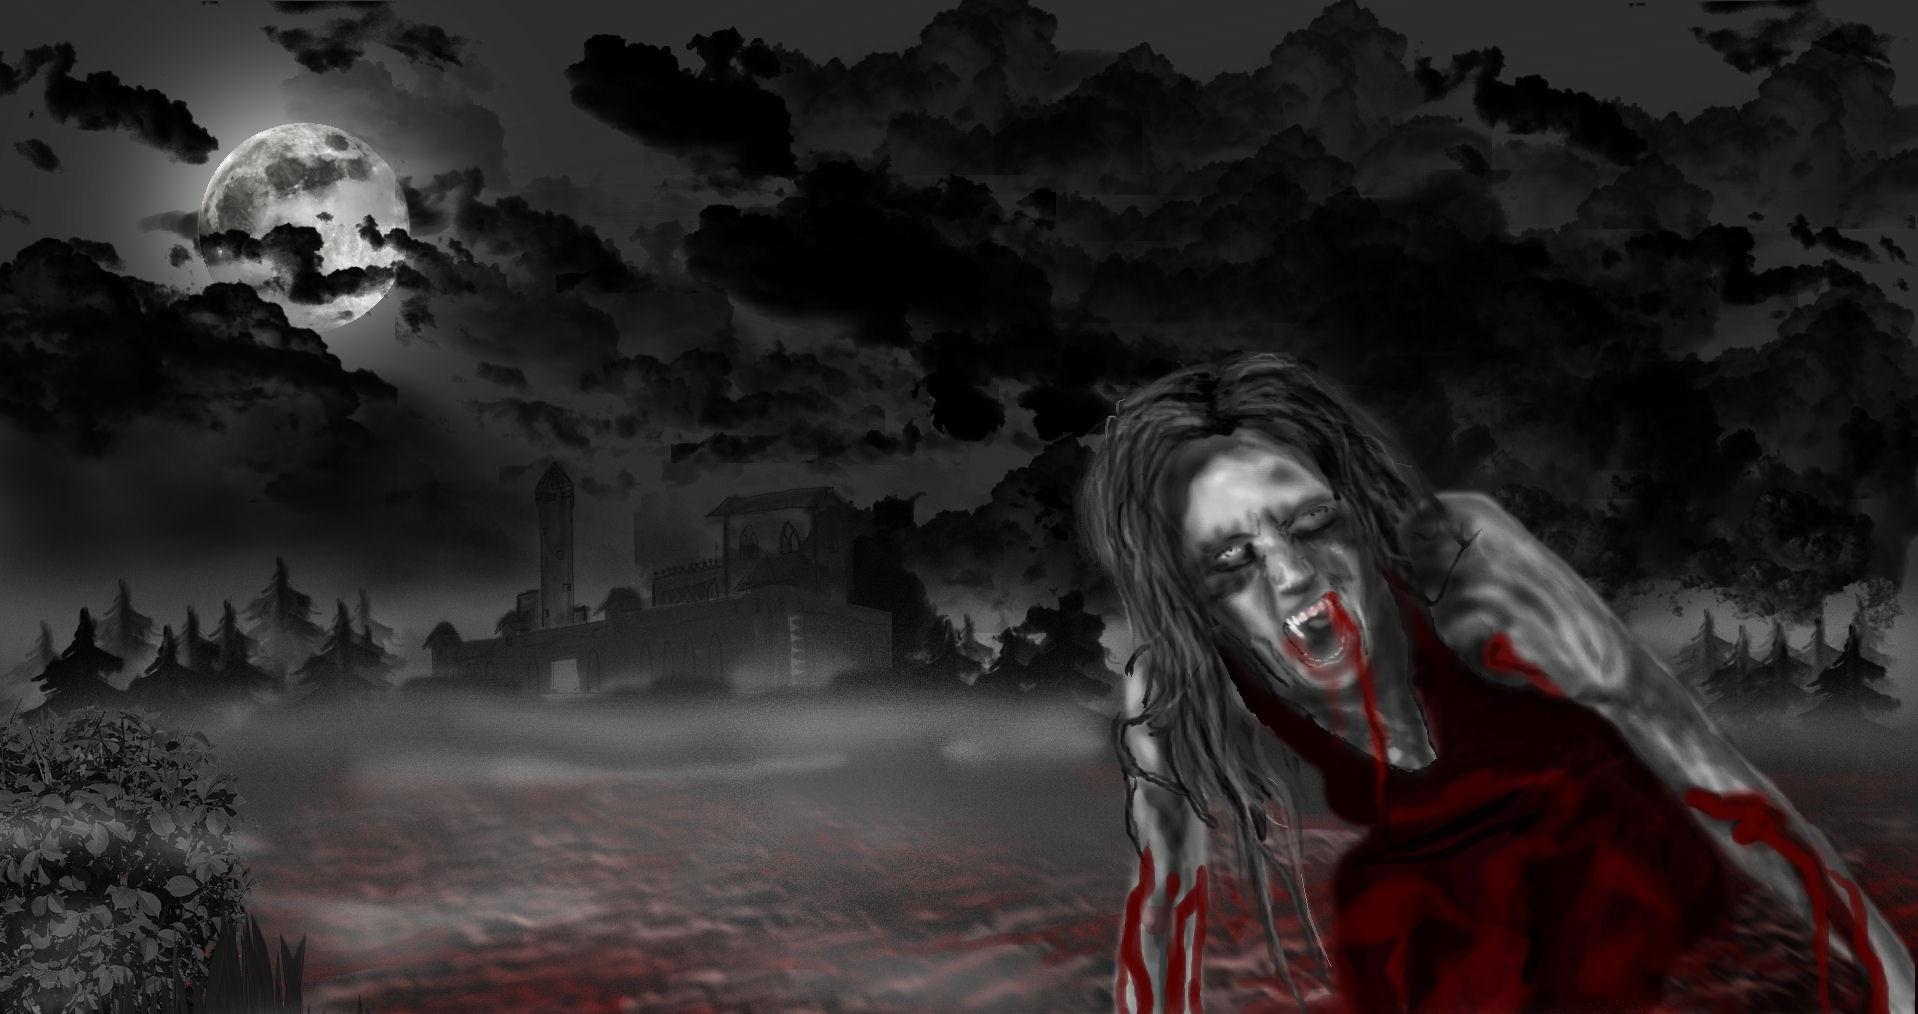 Vampire Wallpaper (83 Wallpapers) – HD Wallpapers